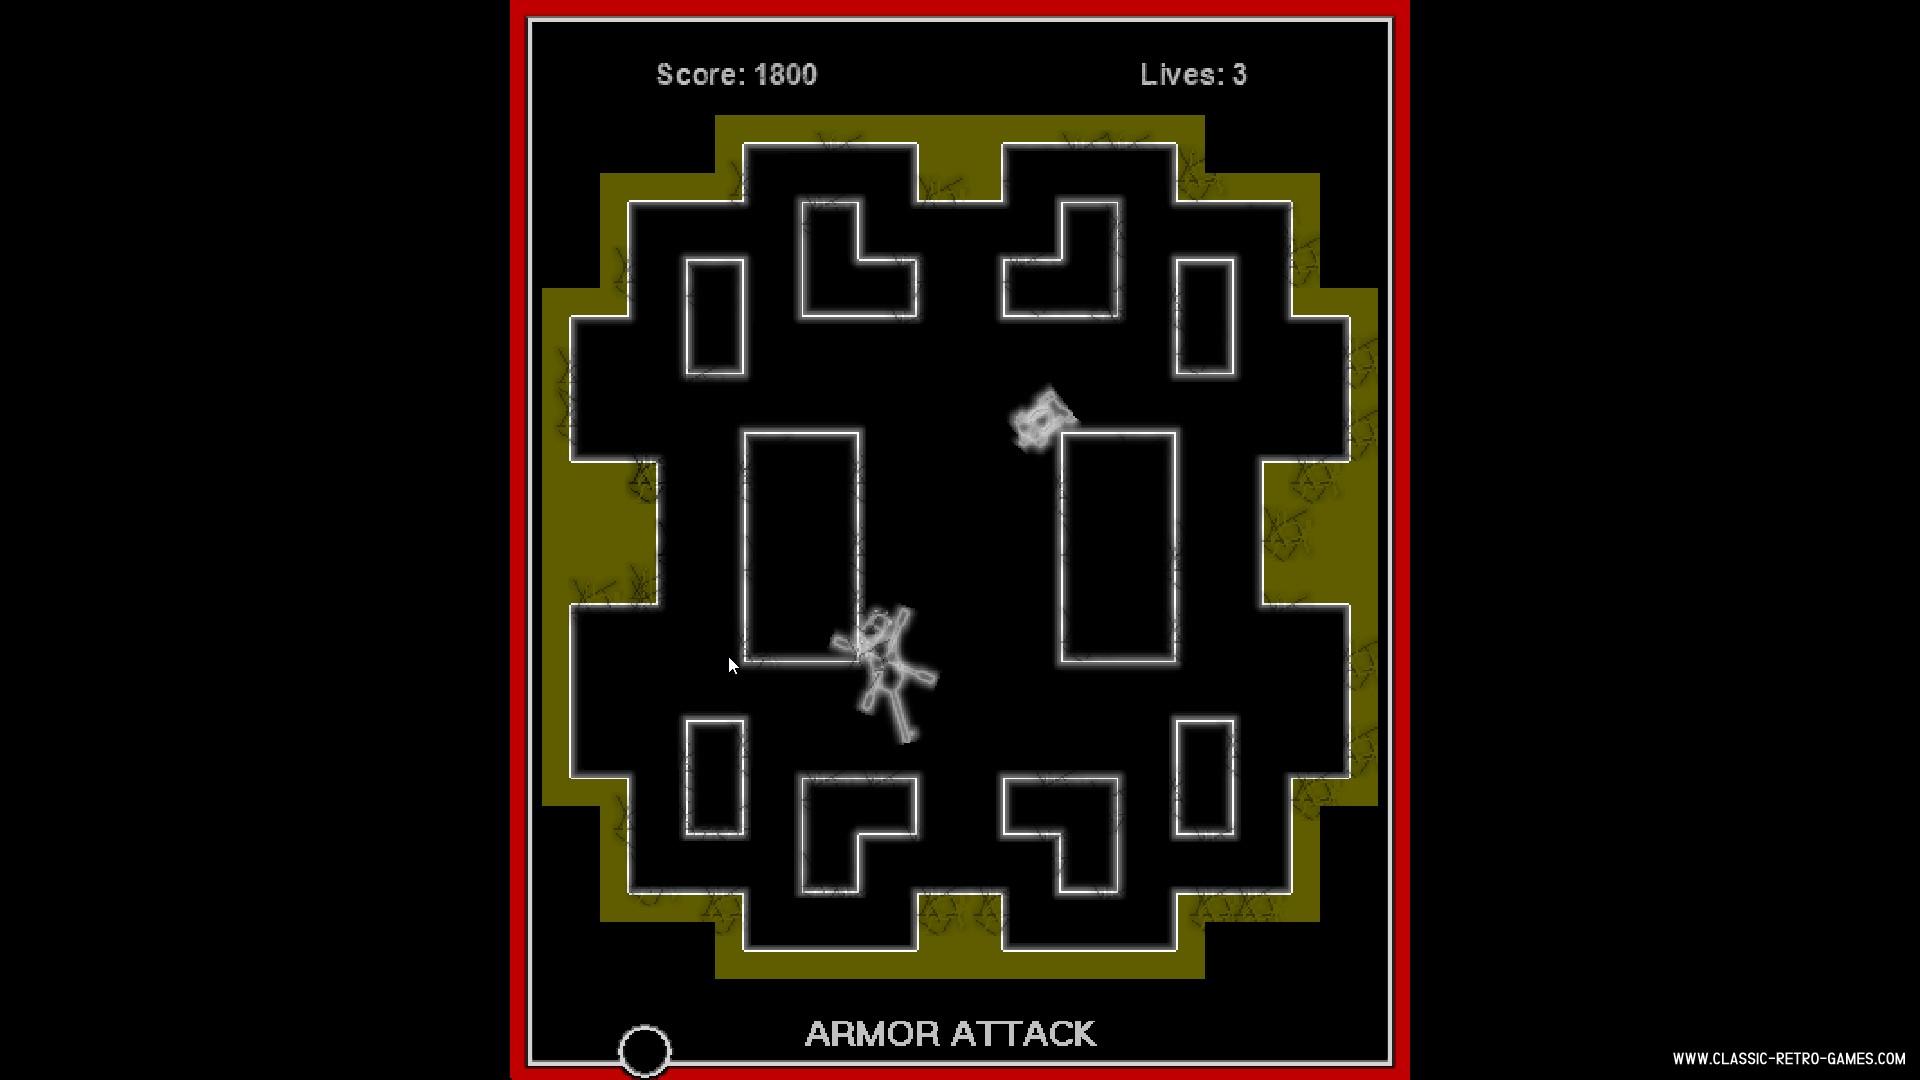 Armor Attack remake